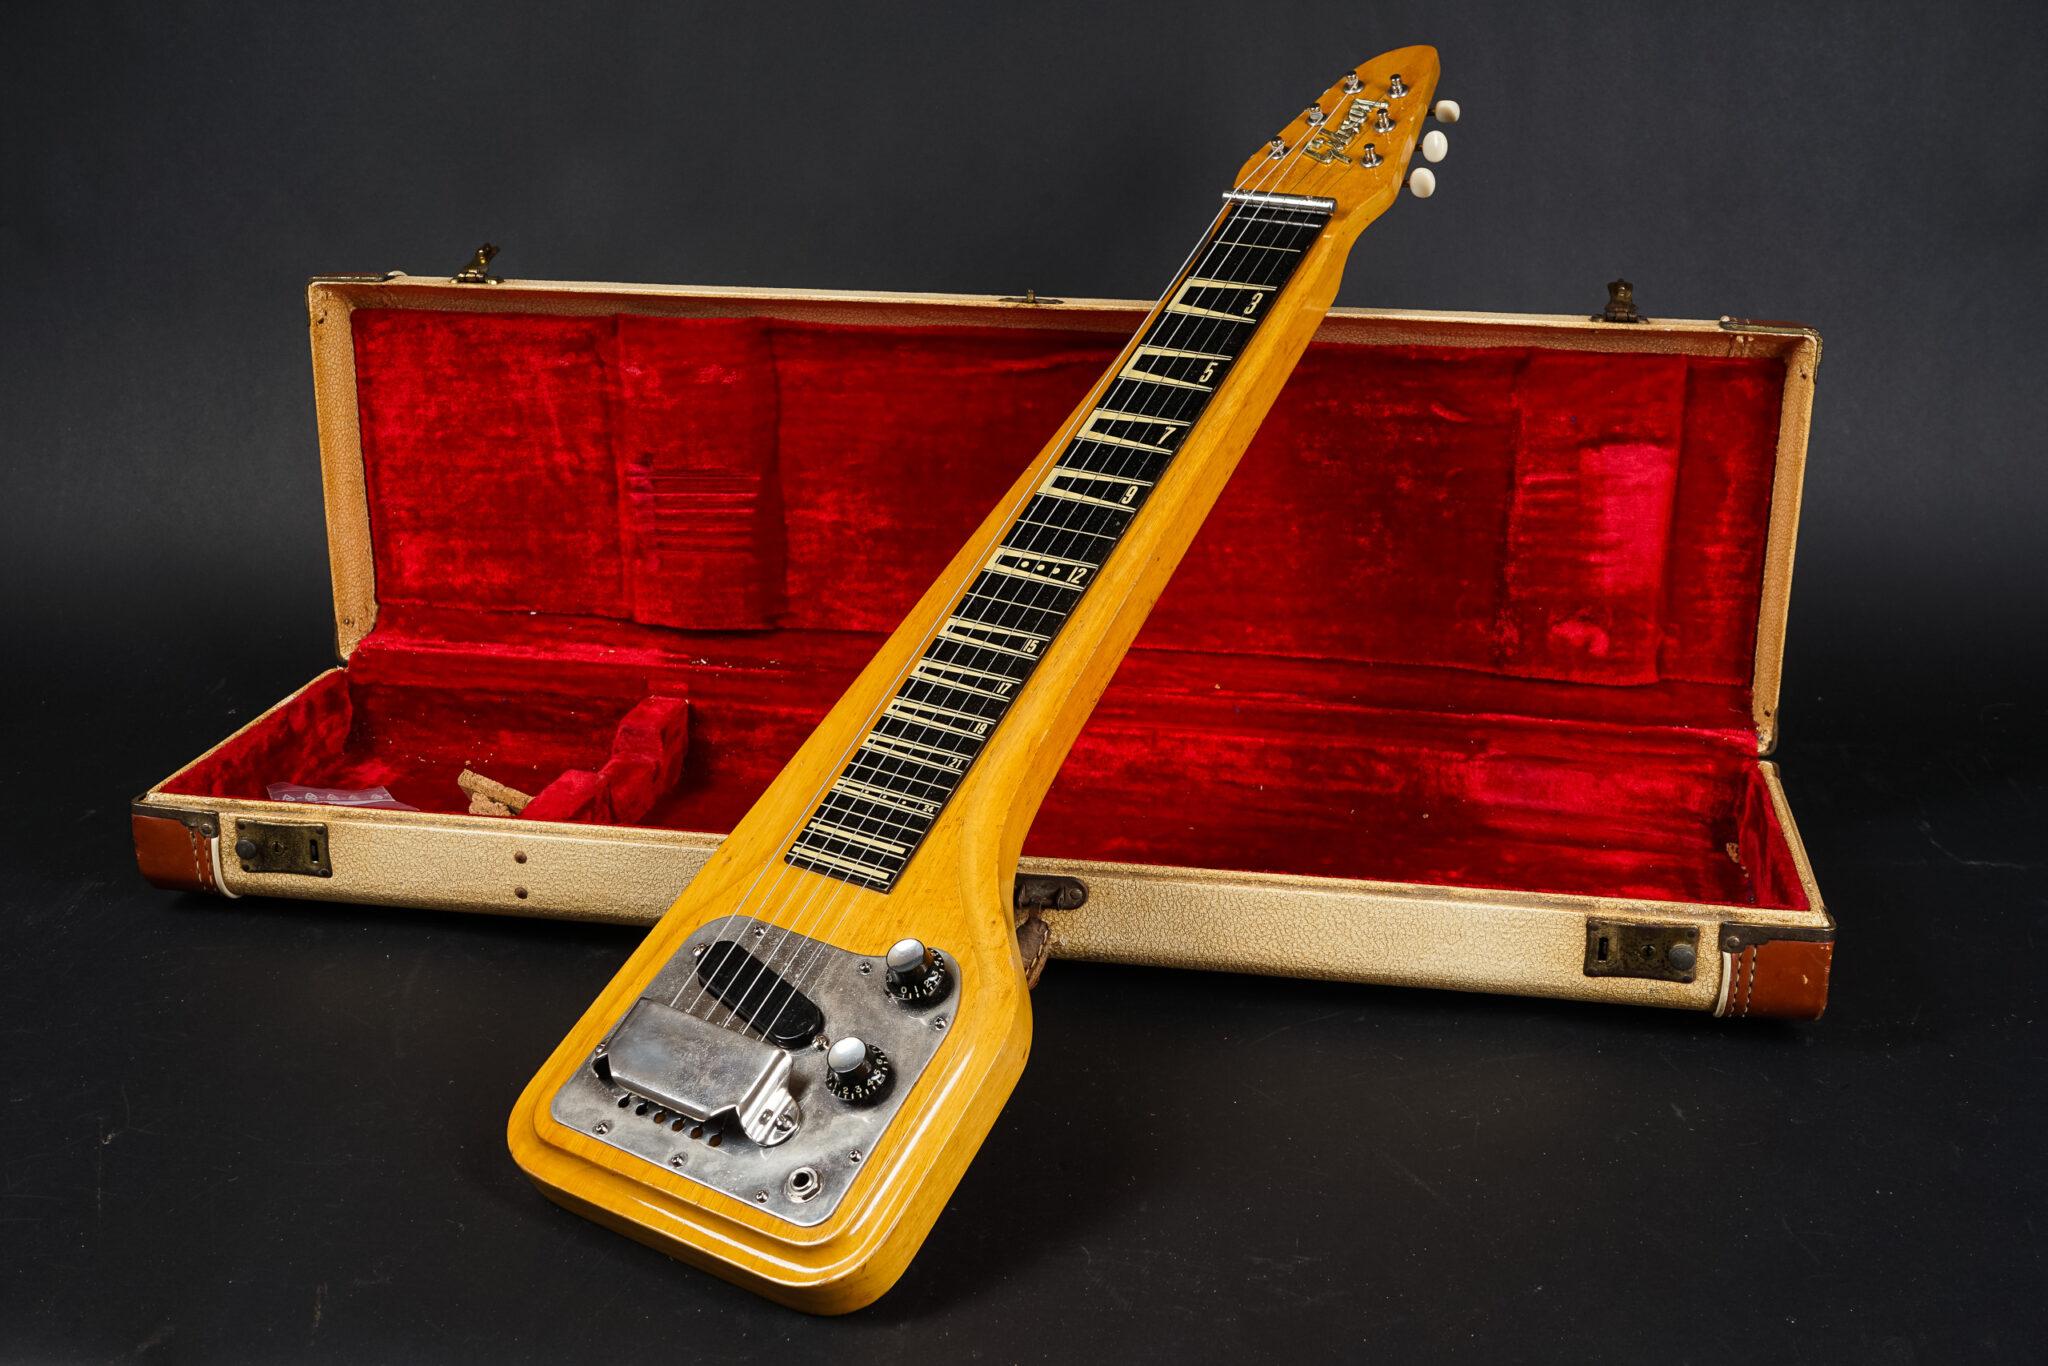 https://guitarpoint.de/app/uploads/products/1960-gibson-eh-500-skylark-lap-steel-guitar-012340/1960-Gibson-eh-500-012340-1-2048x1366.jpg